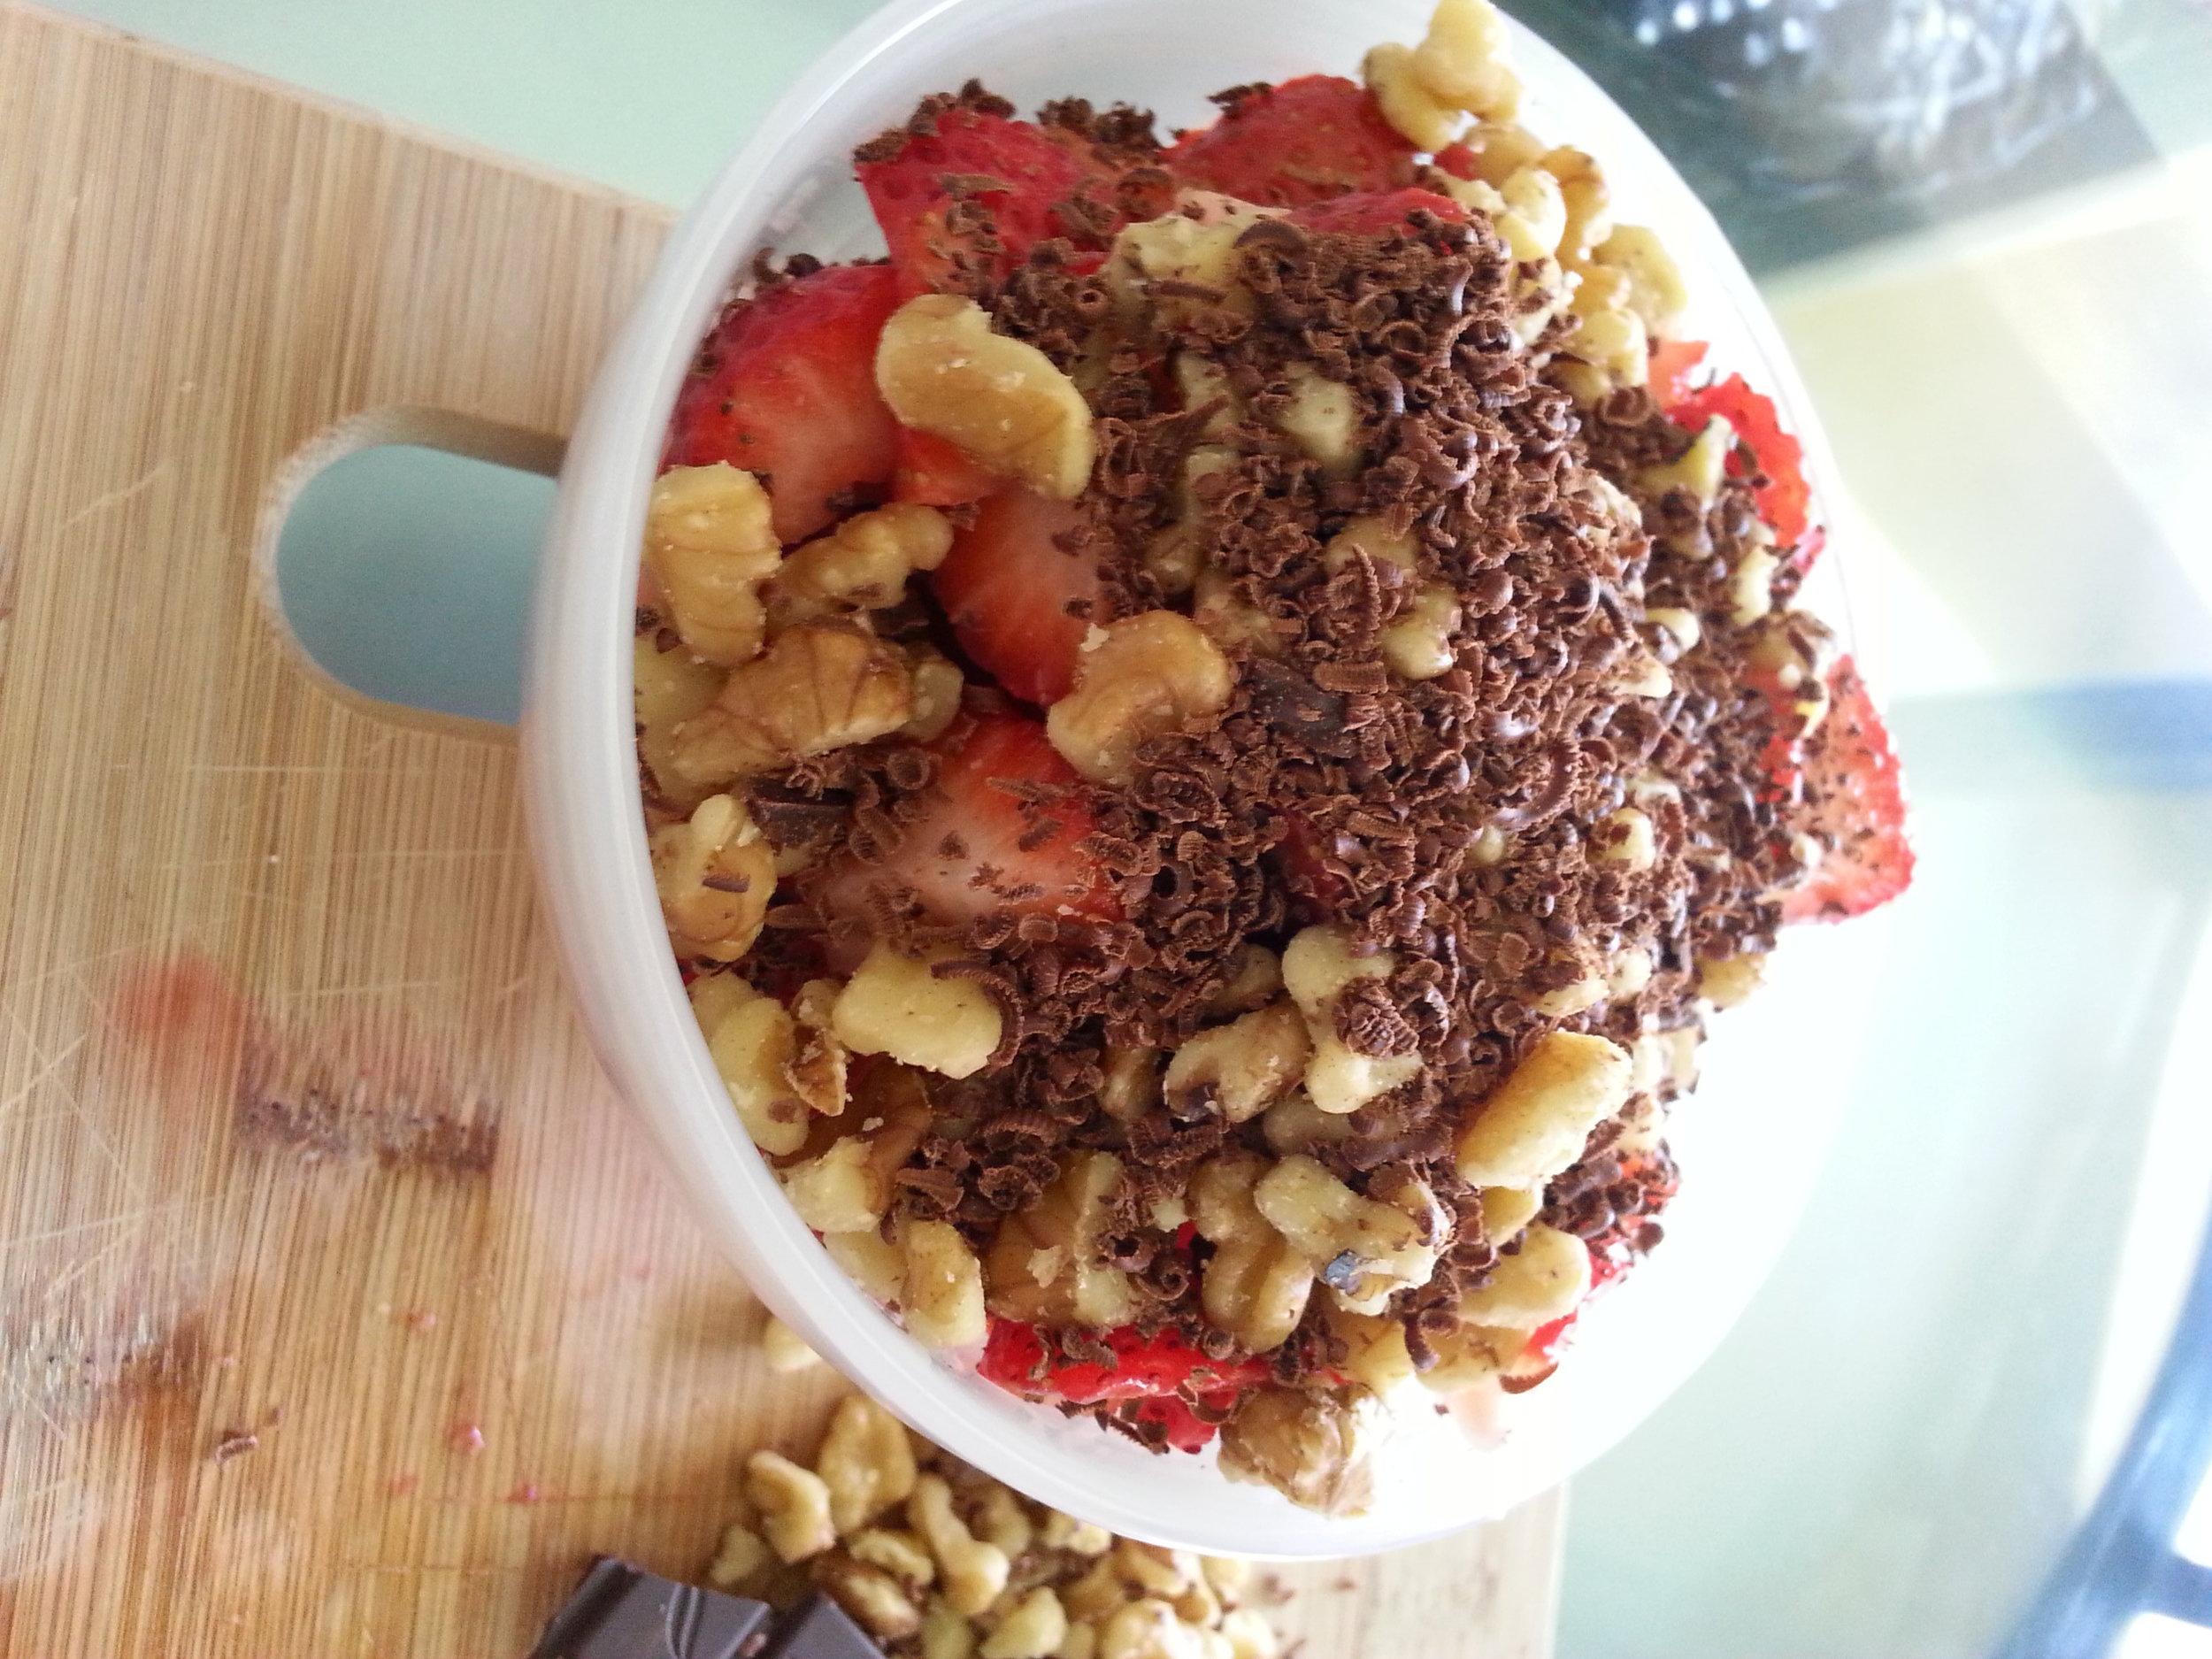 strawberry snack with chocolate walnuts